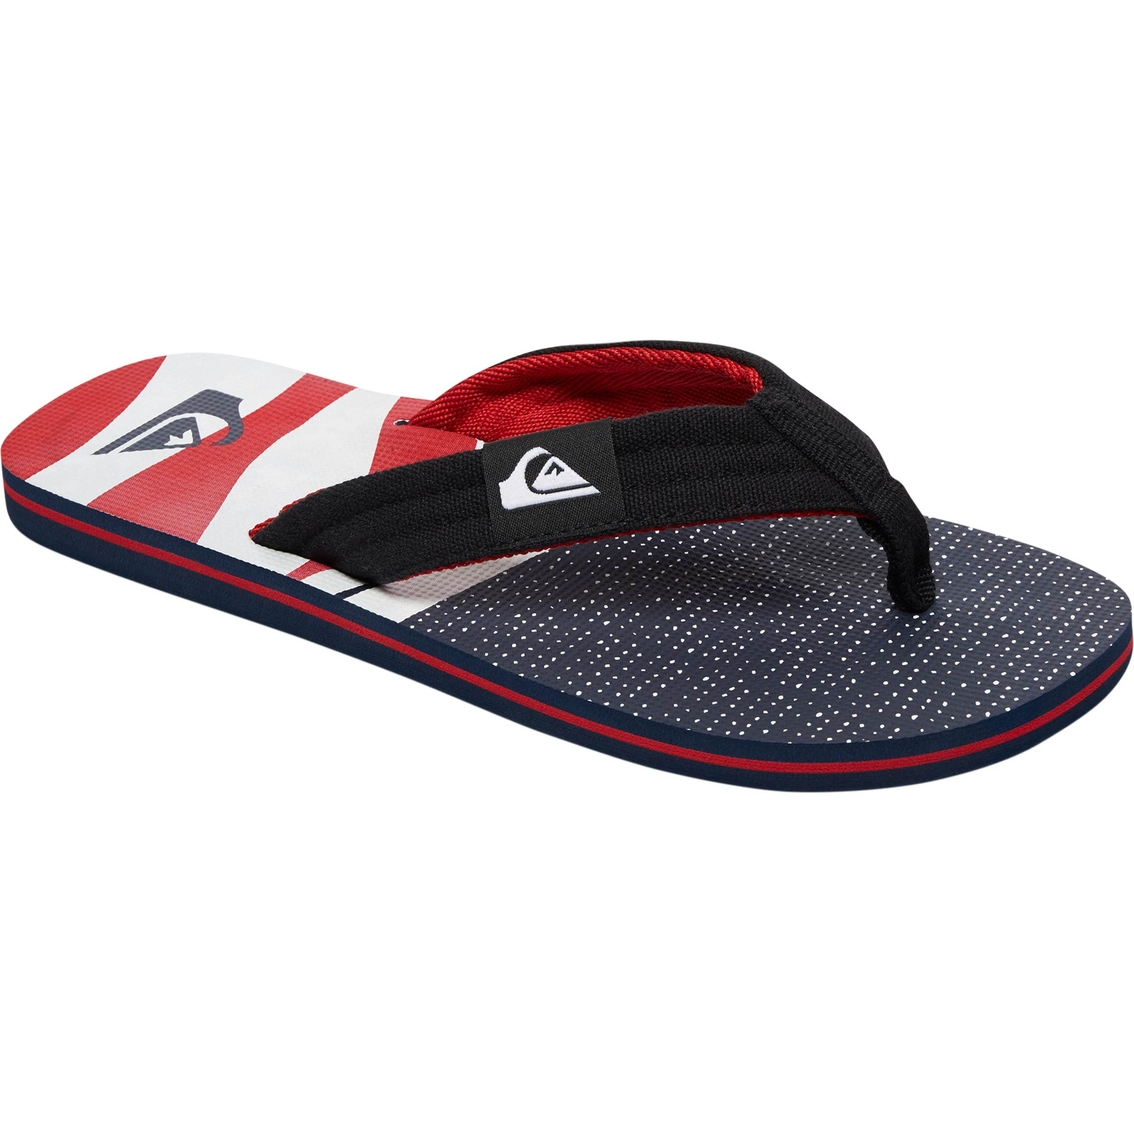 f81906ac6c72 Quiksilver Men s Molokai Layback Sandals